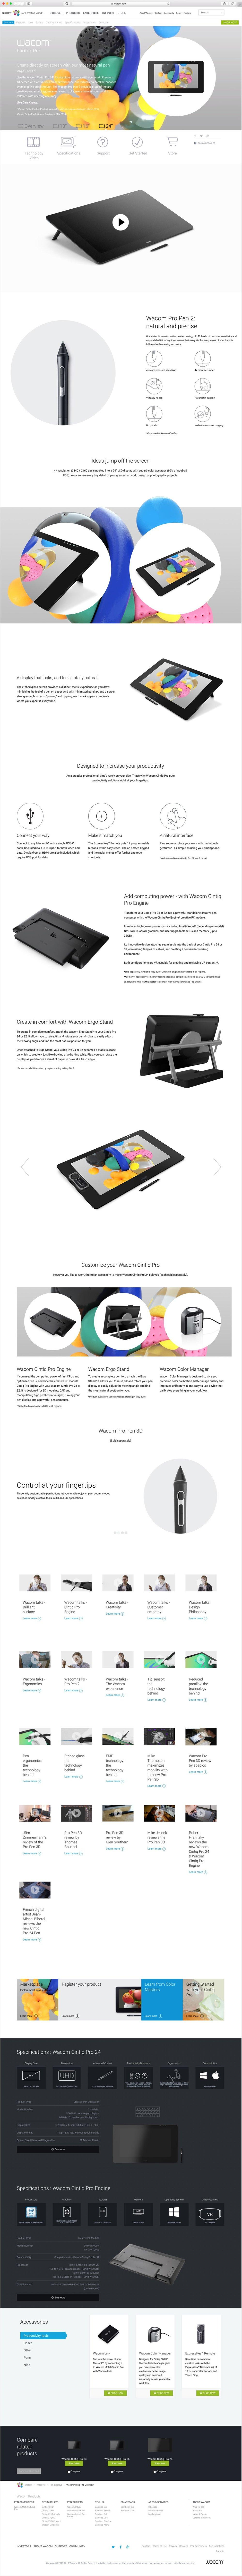 Wacom Cintiq 24 Overview.jpg